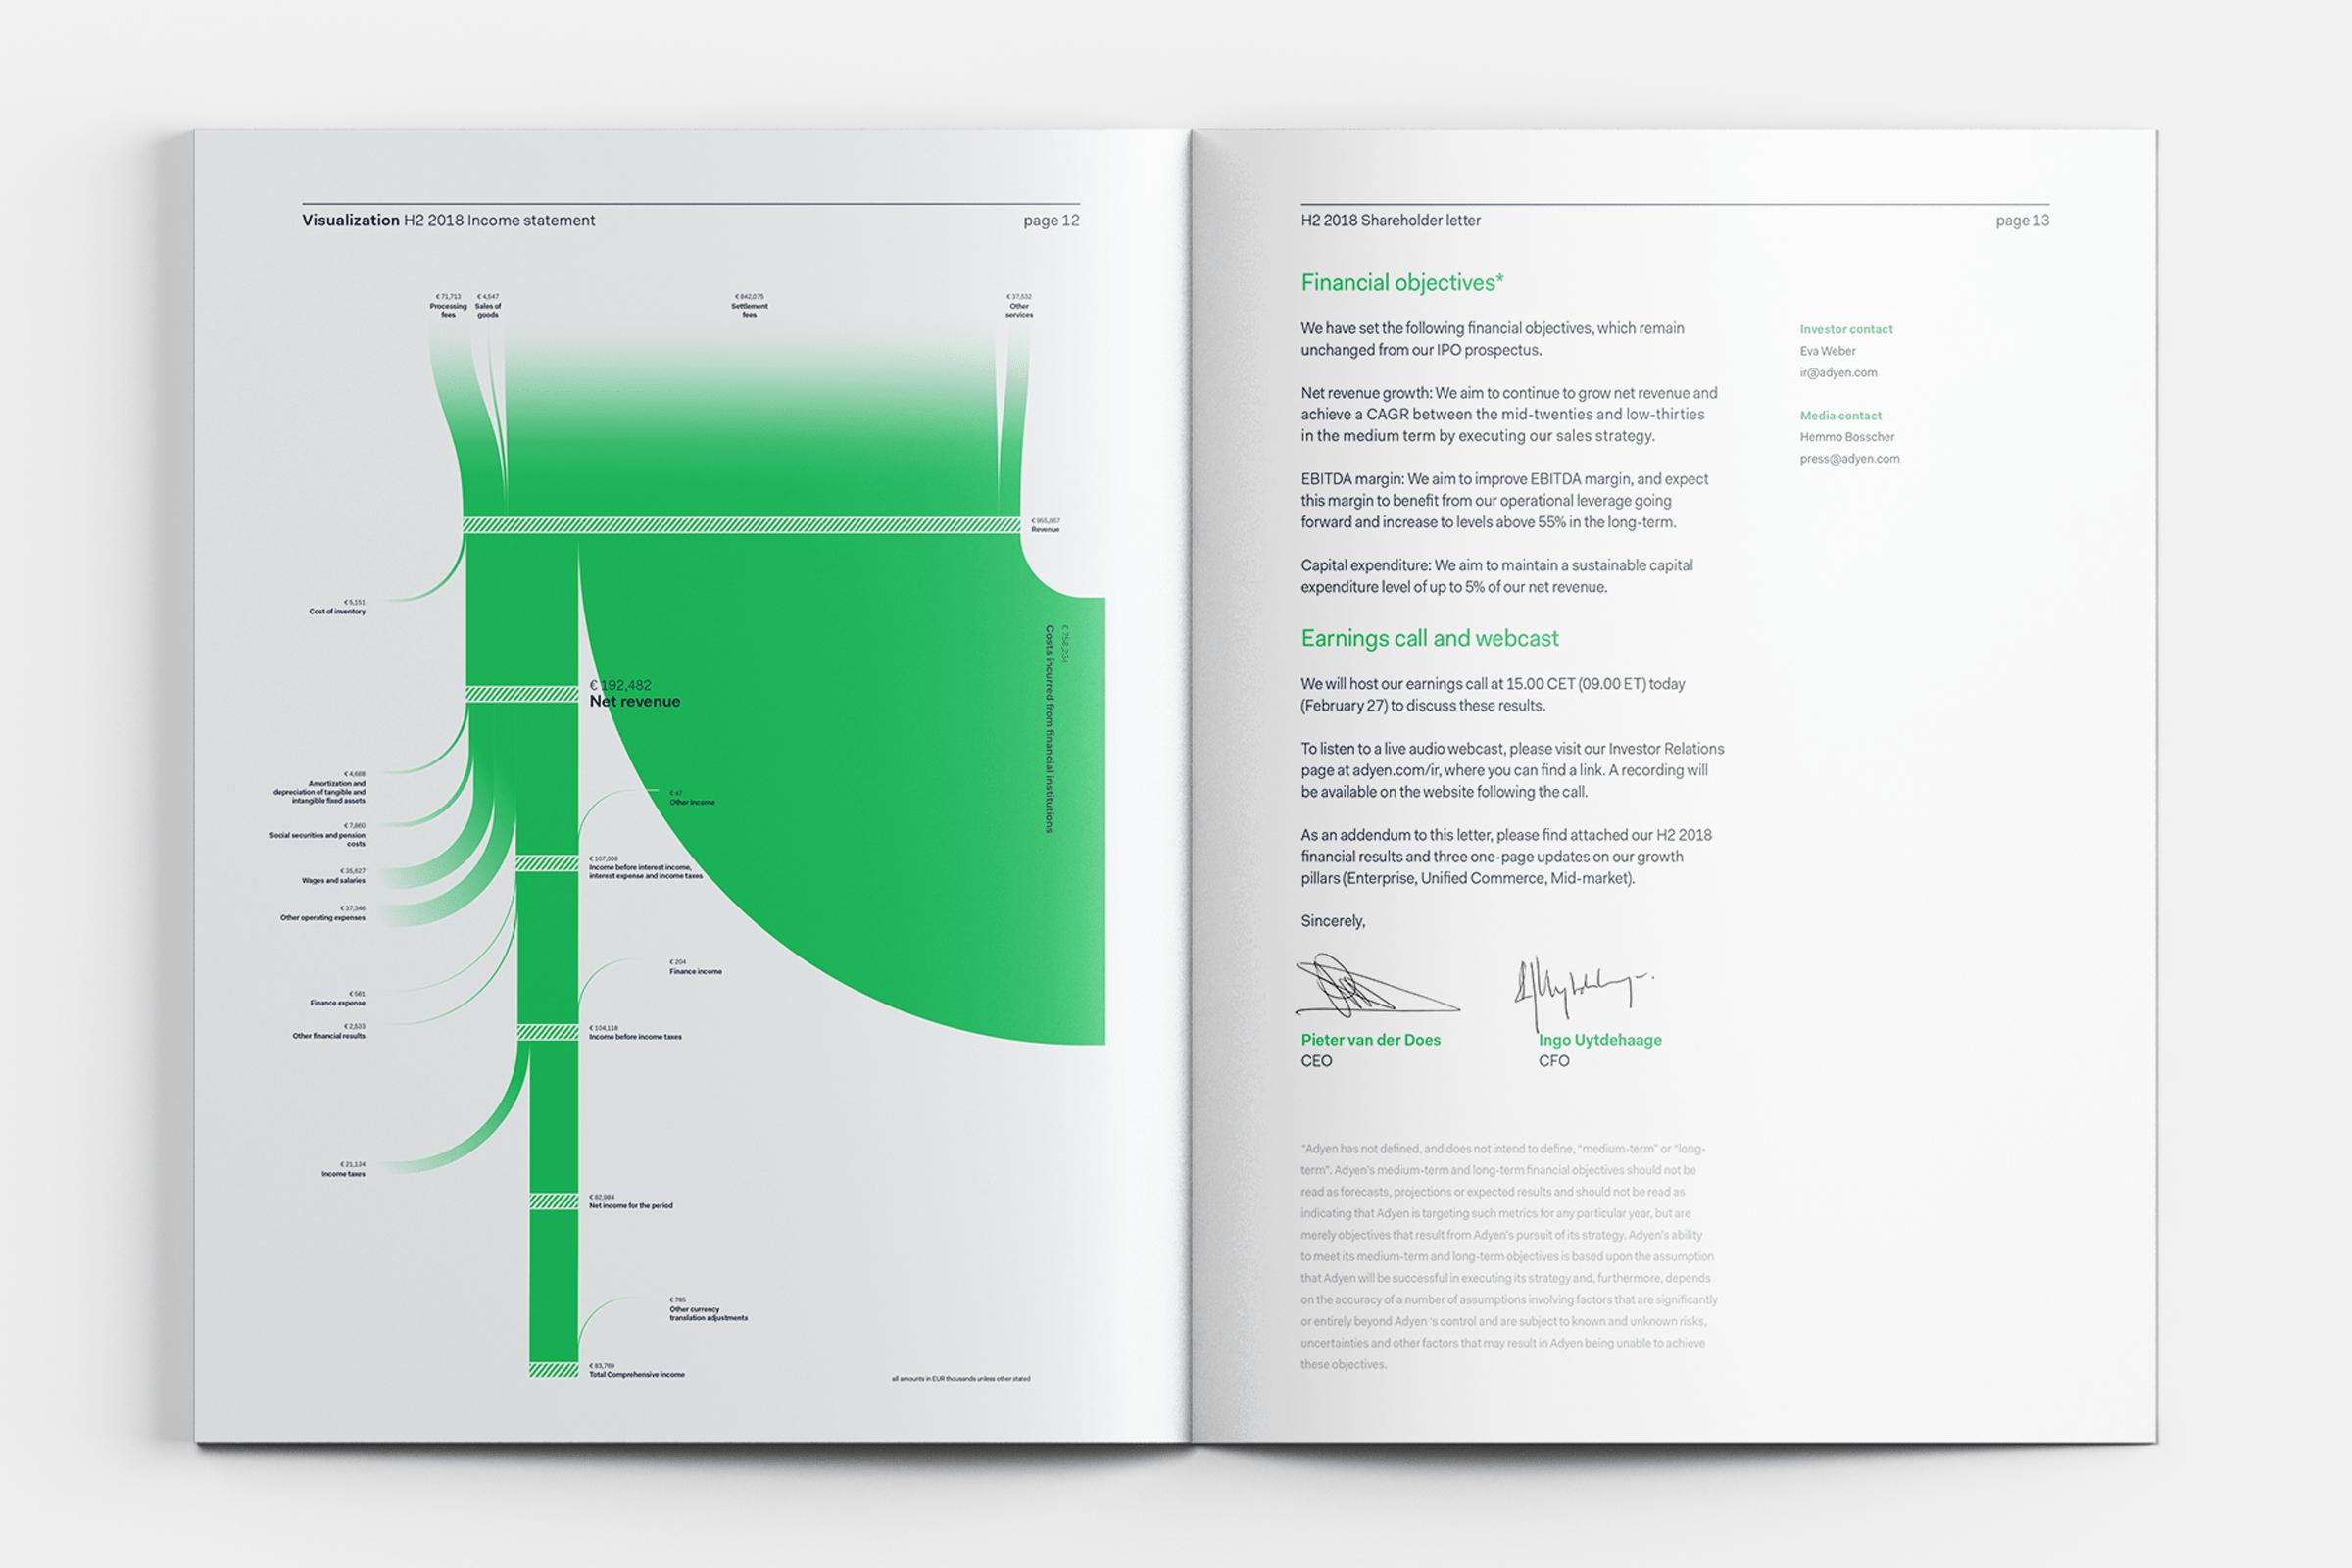 The Flow / Sankey diagram of Adyen's income statement